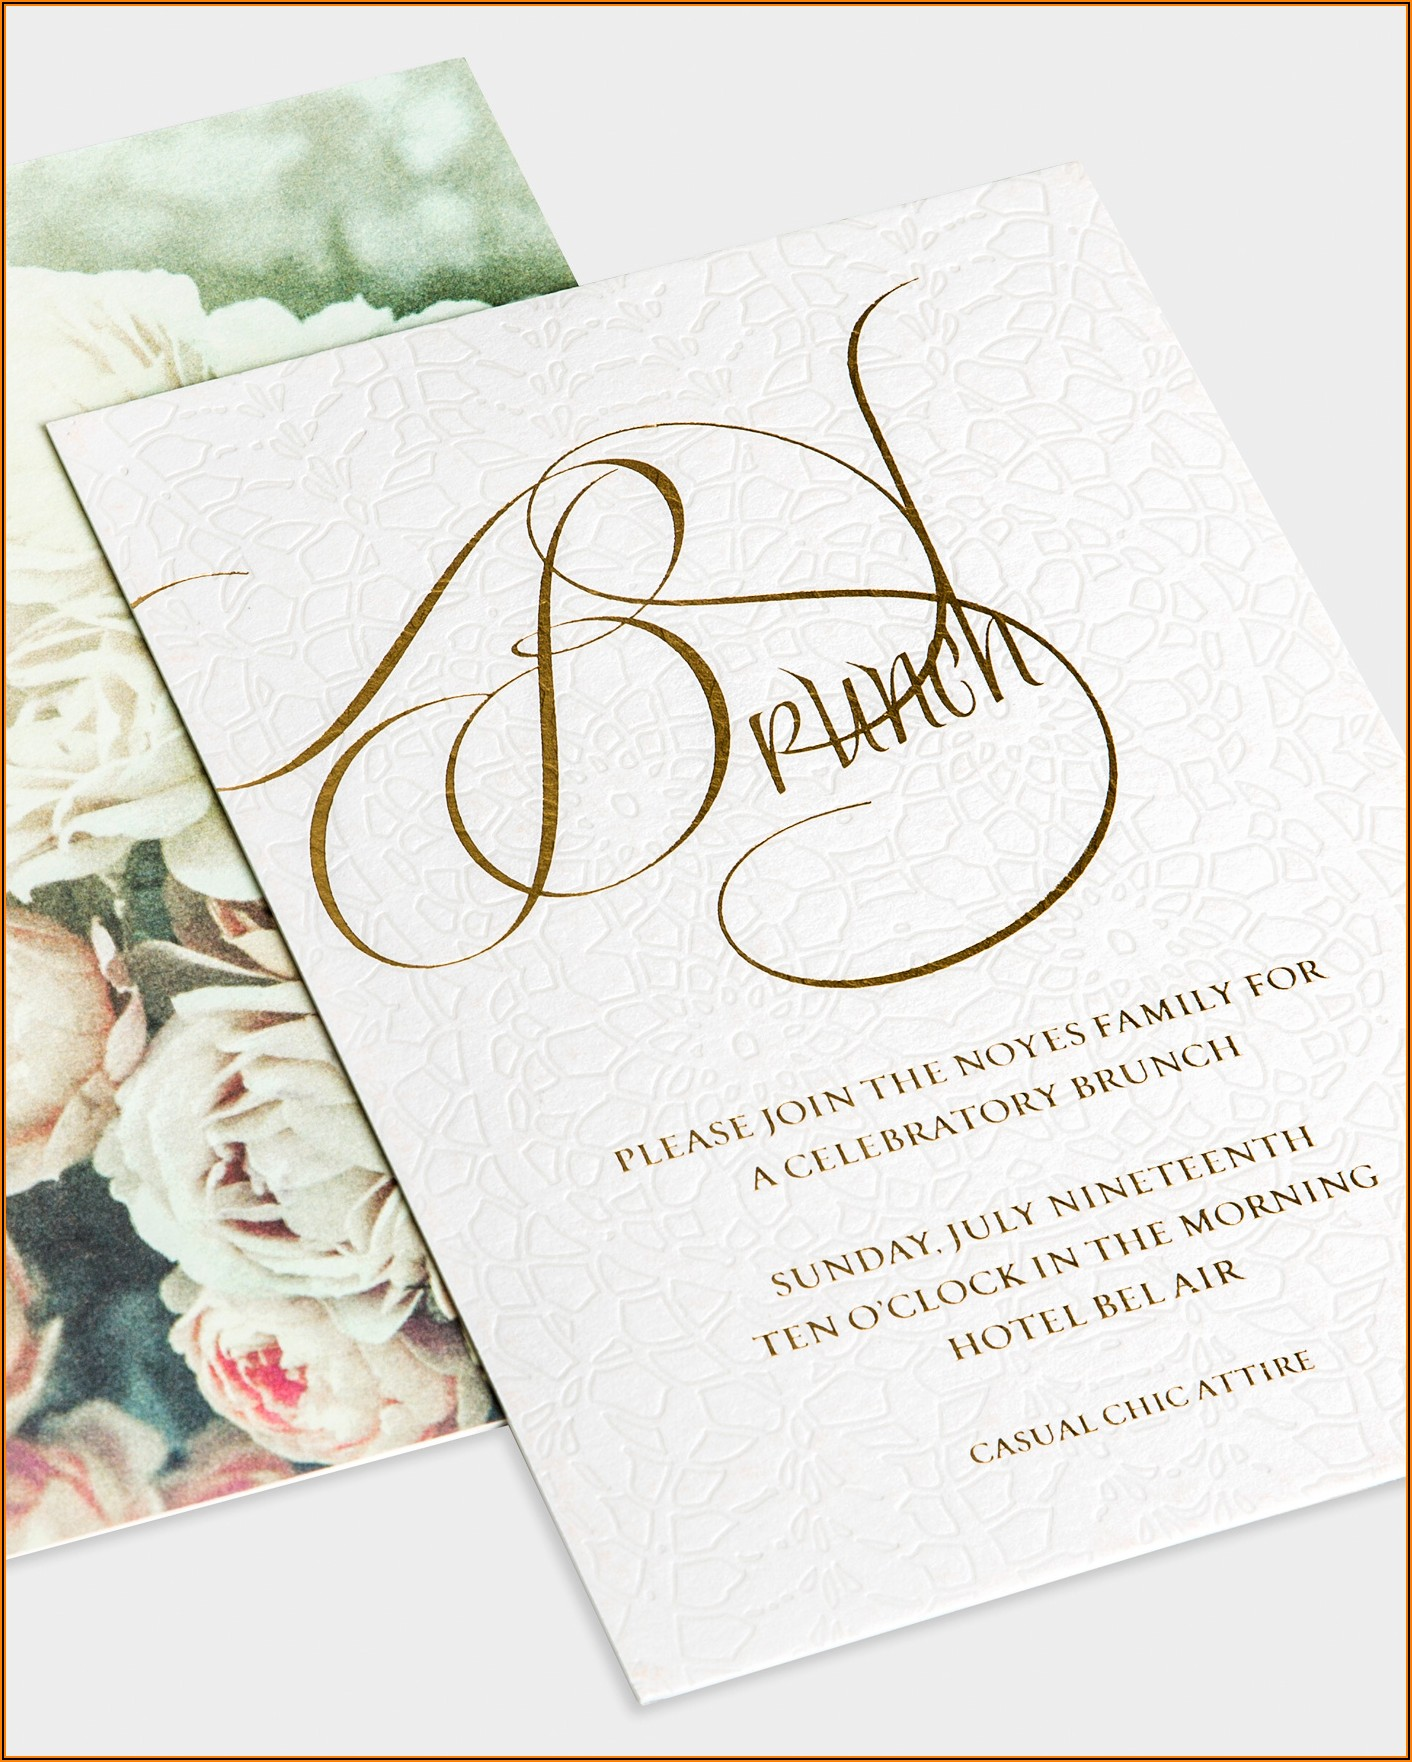 Farewell Brunch Invitation Wording